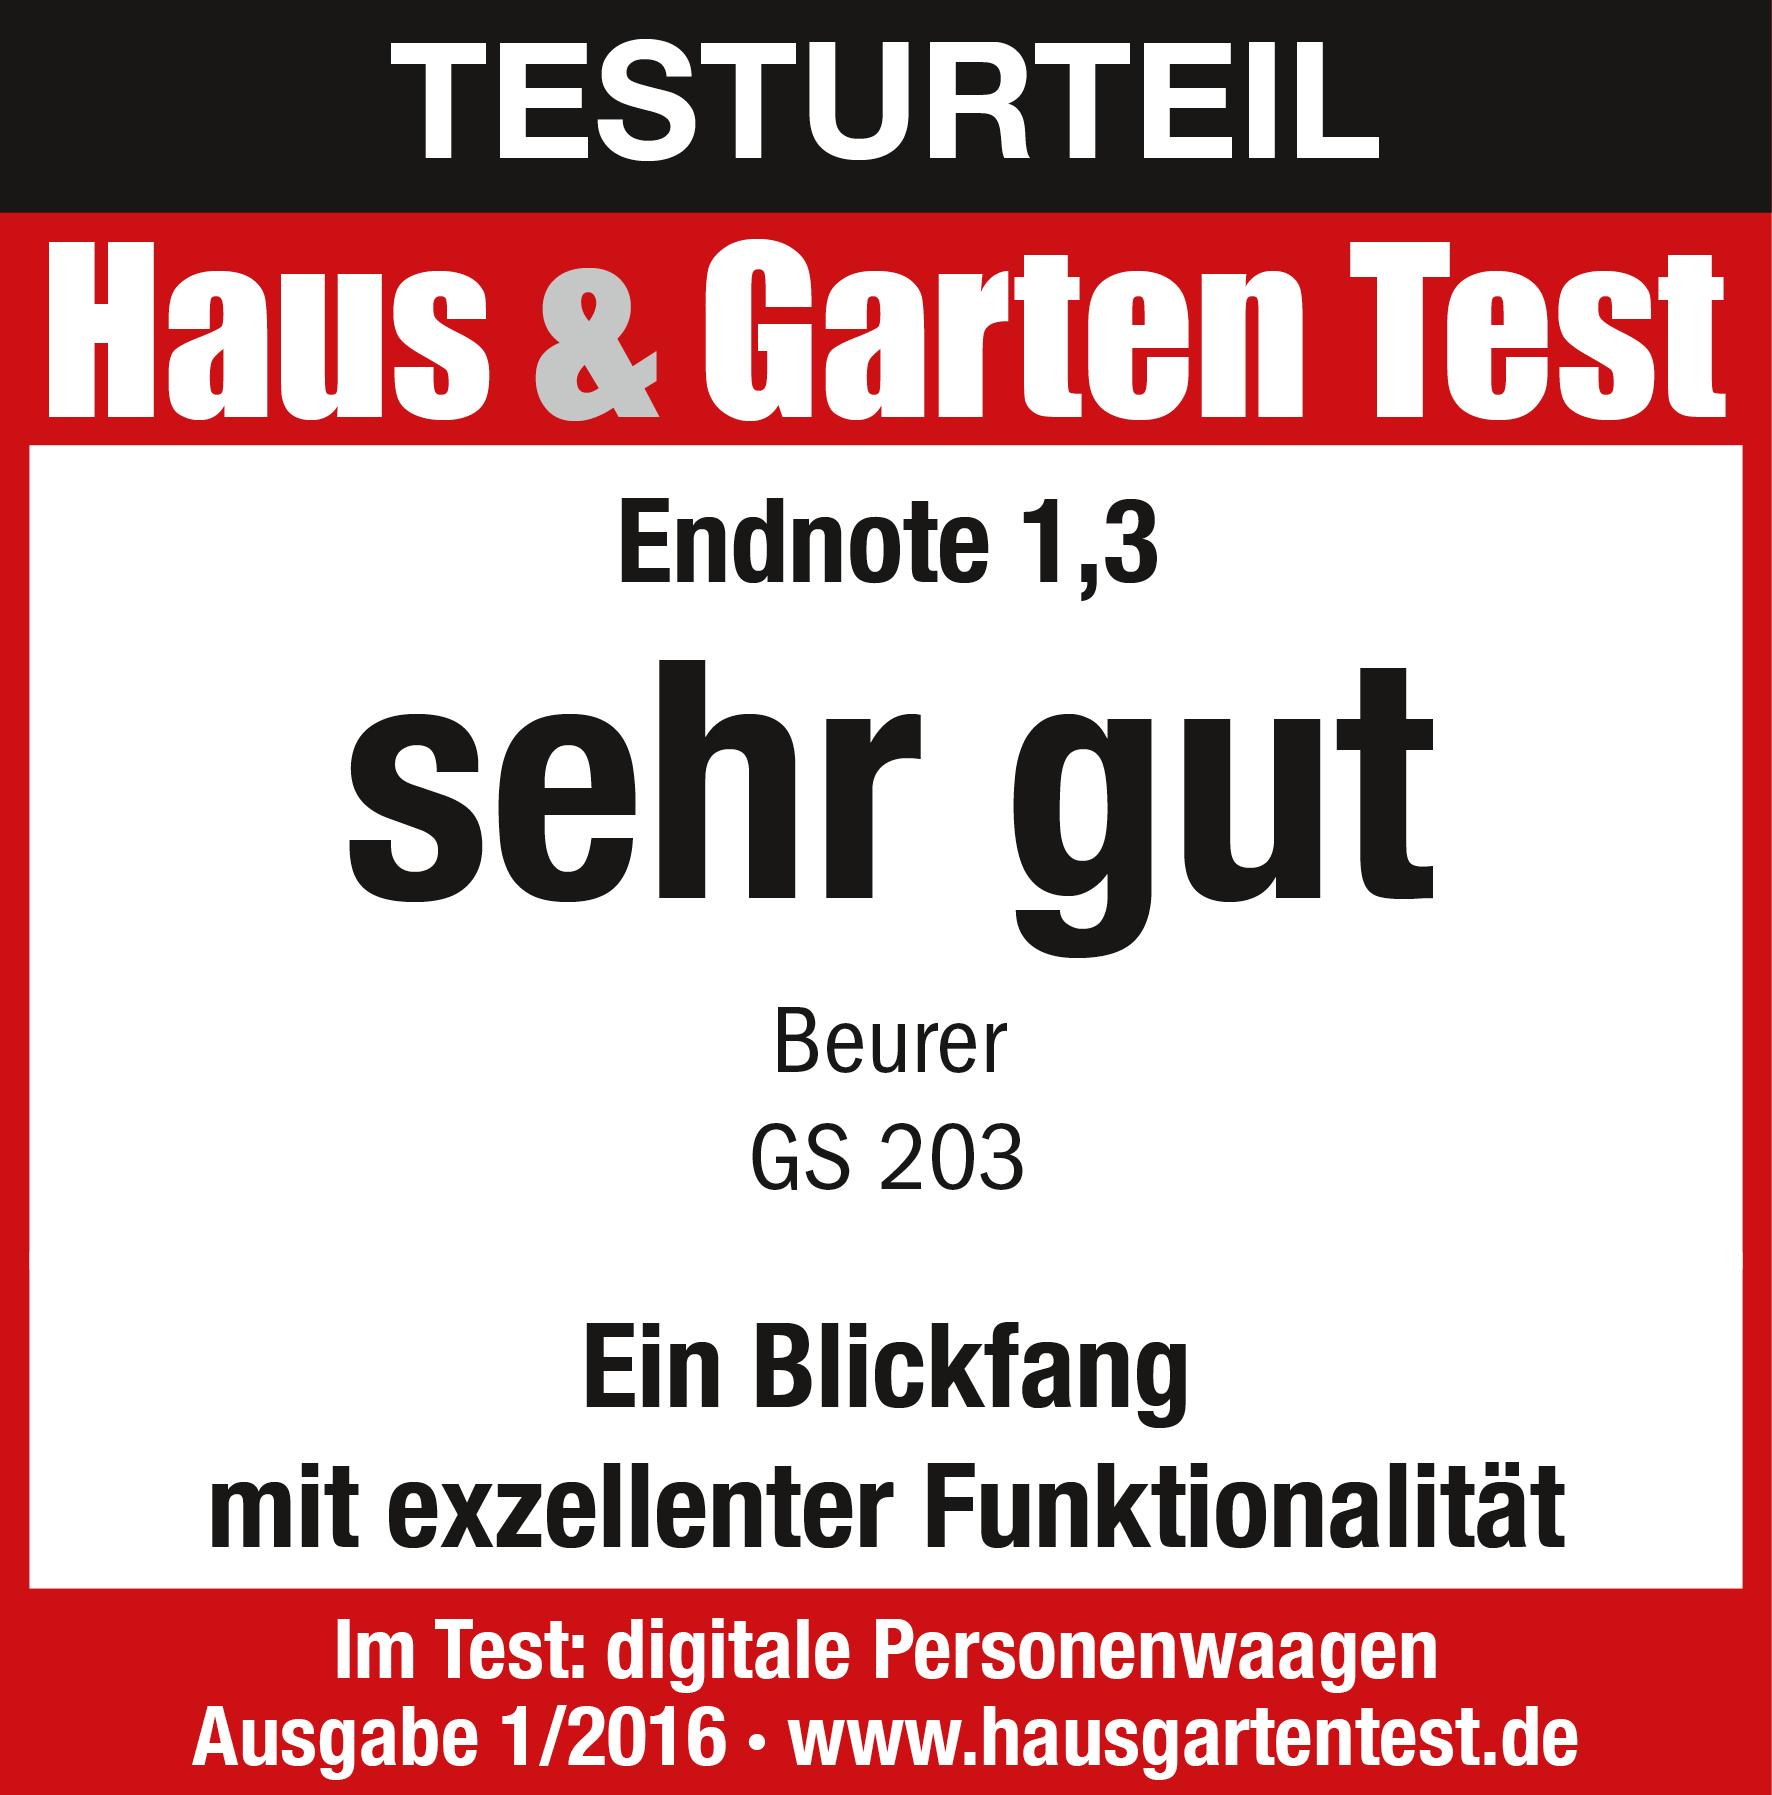 https://www.beurer-shop.de/media/images/attributevalueimages/gs203_haus-garten_sehrgut_0116.png